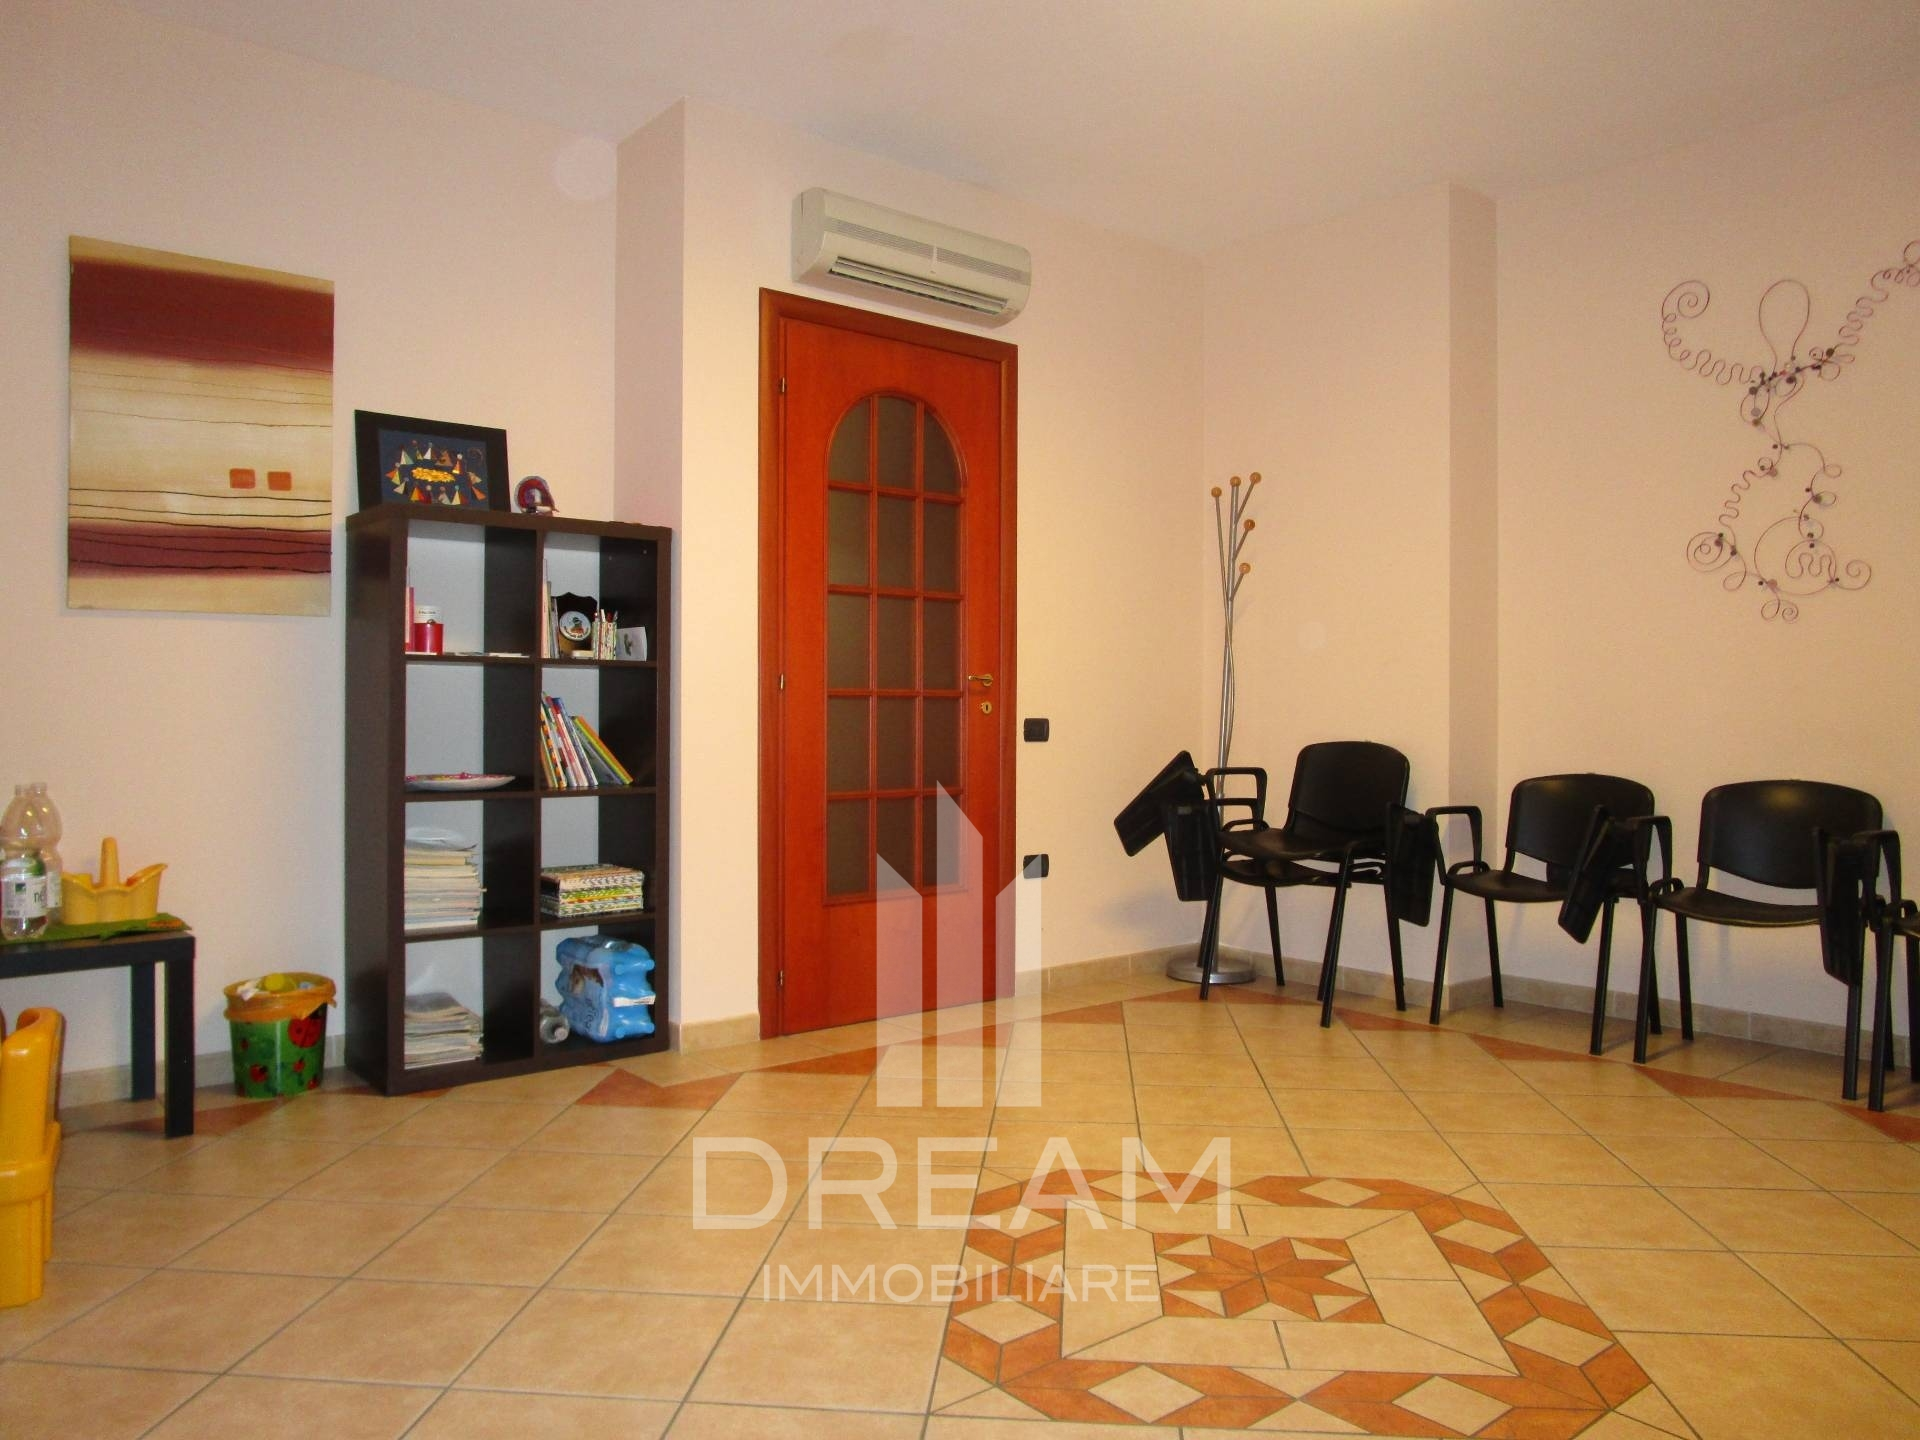 Ufficio Postale A Quartu Sant Elena : Appartamento in vendita a quartu santelena cod. a653